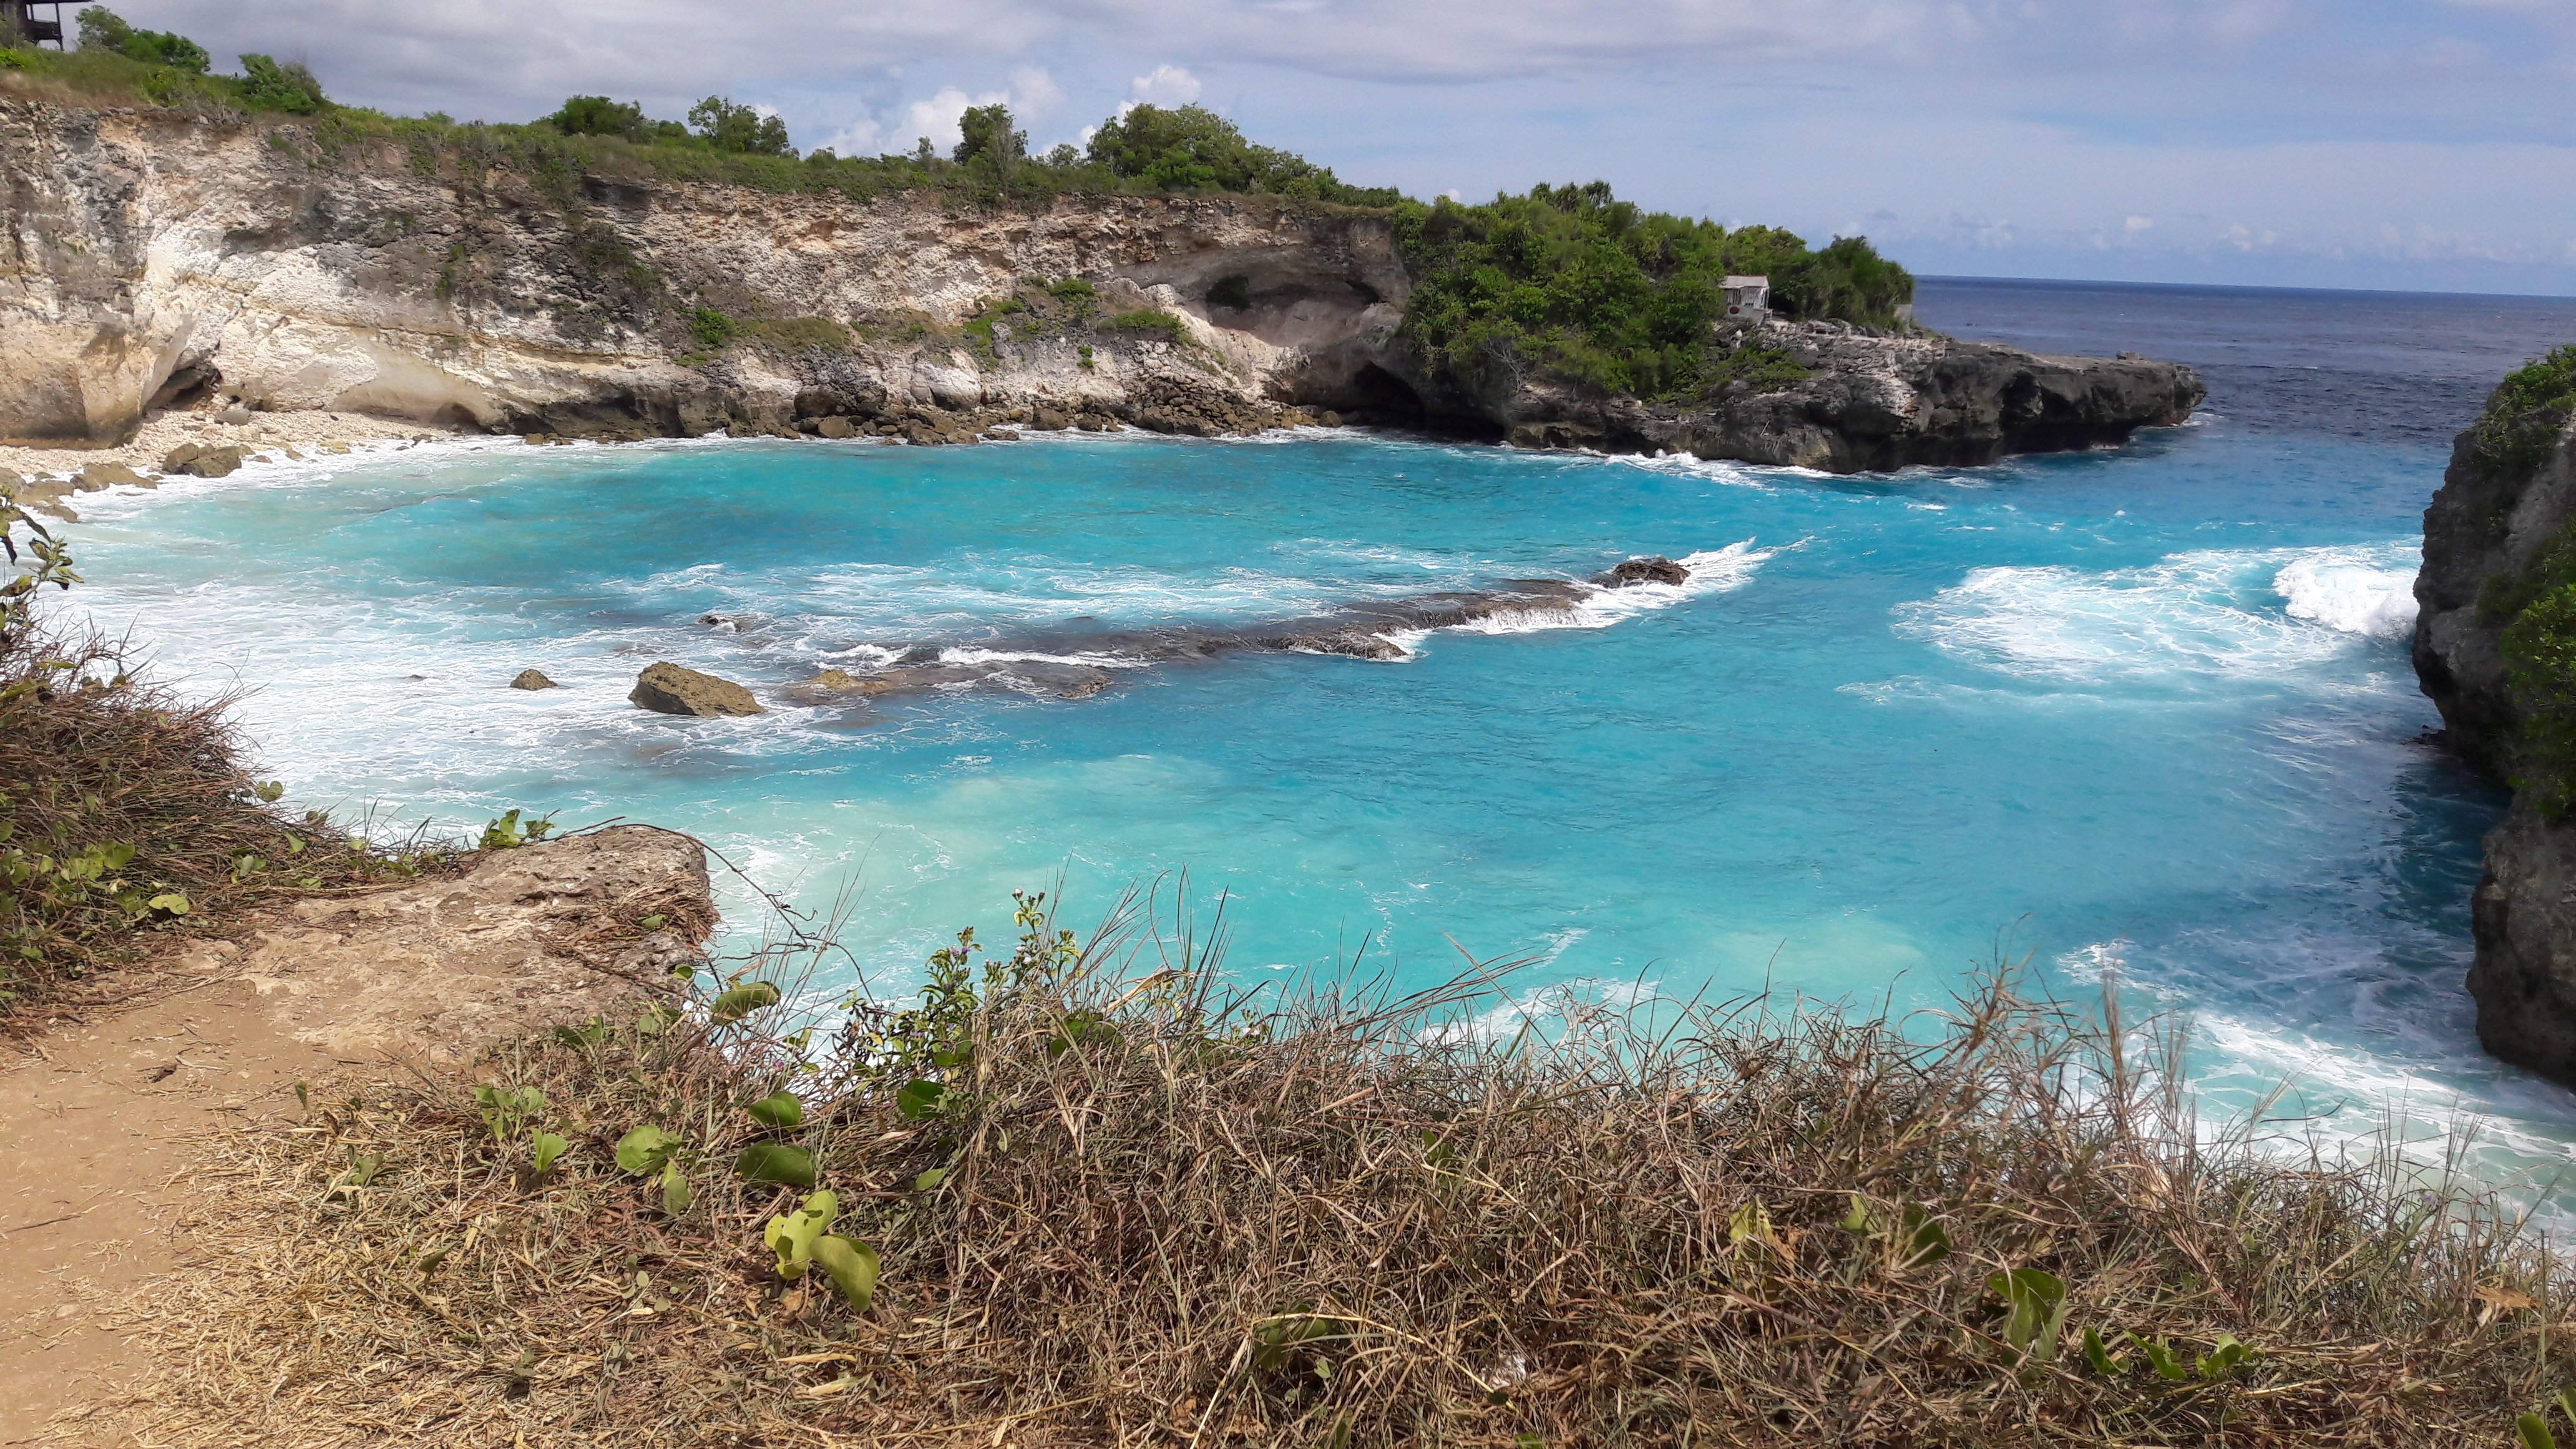 File:Blue Lagoon,Nusa Lembongan-Bali.jpg - Wikipedia